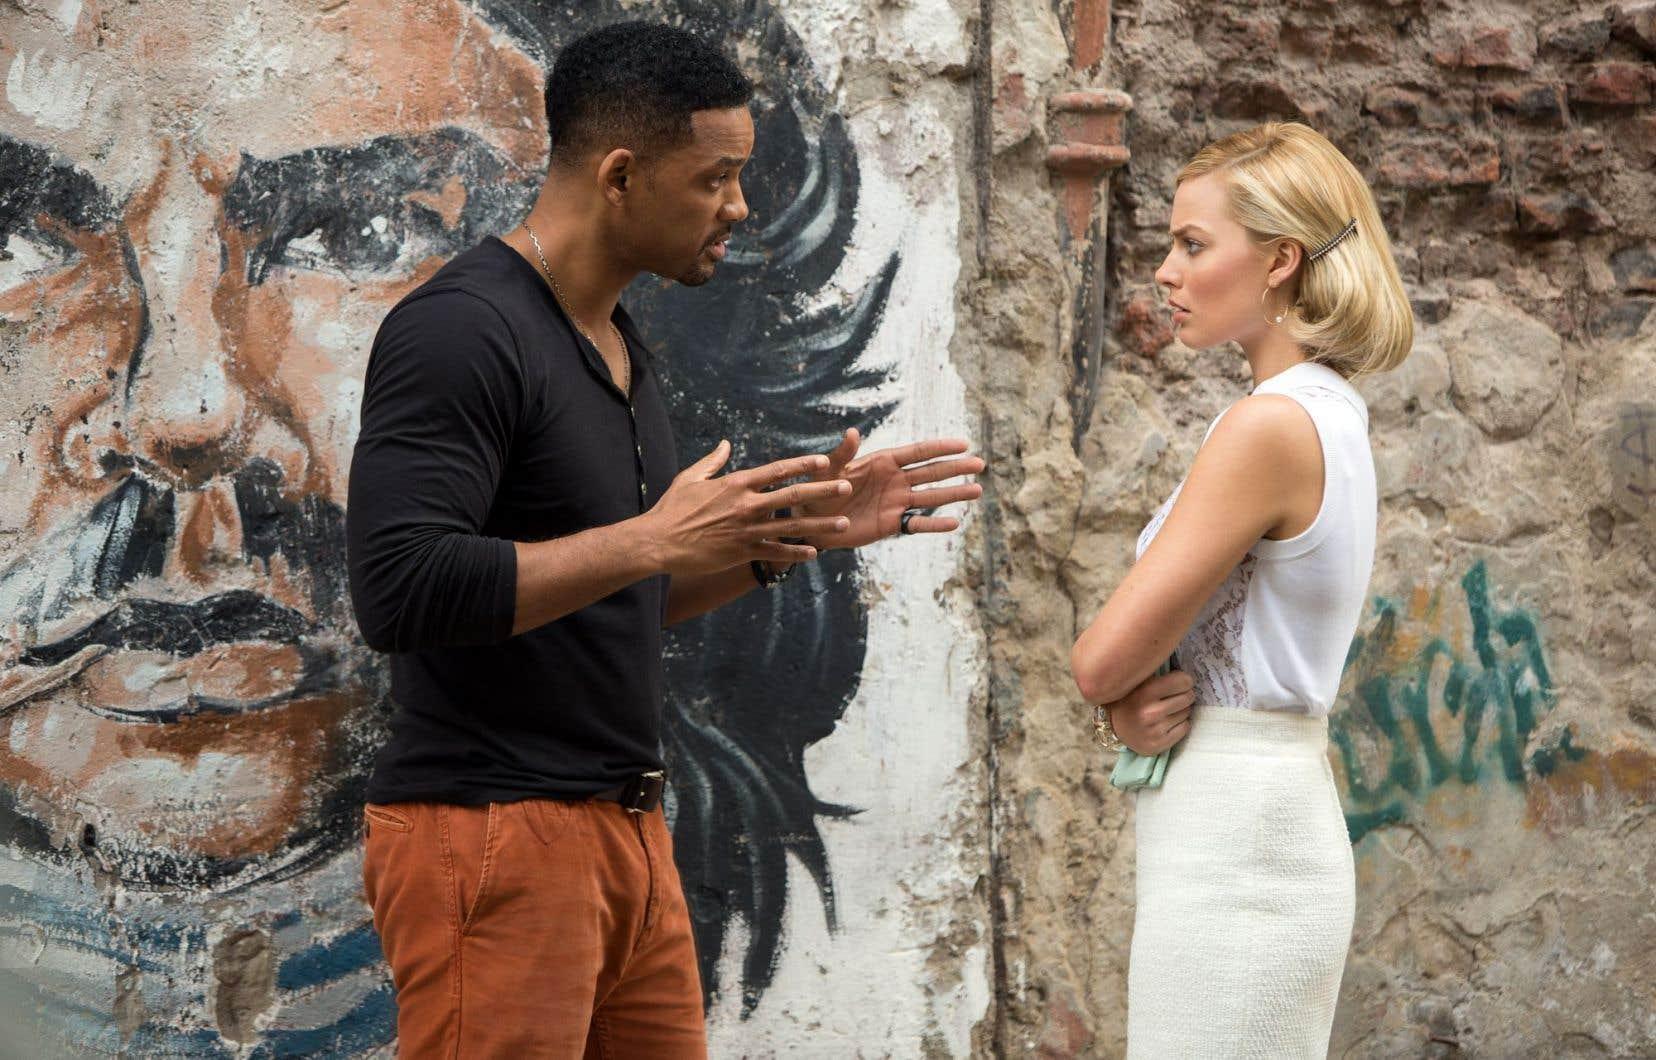 Will Smith et Margot Robbie dans Focus, un film qui fait rimer arnaque et romance.